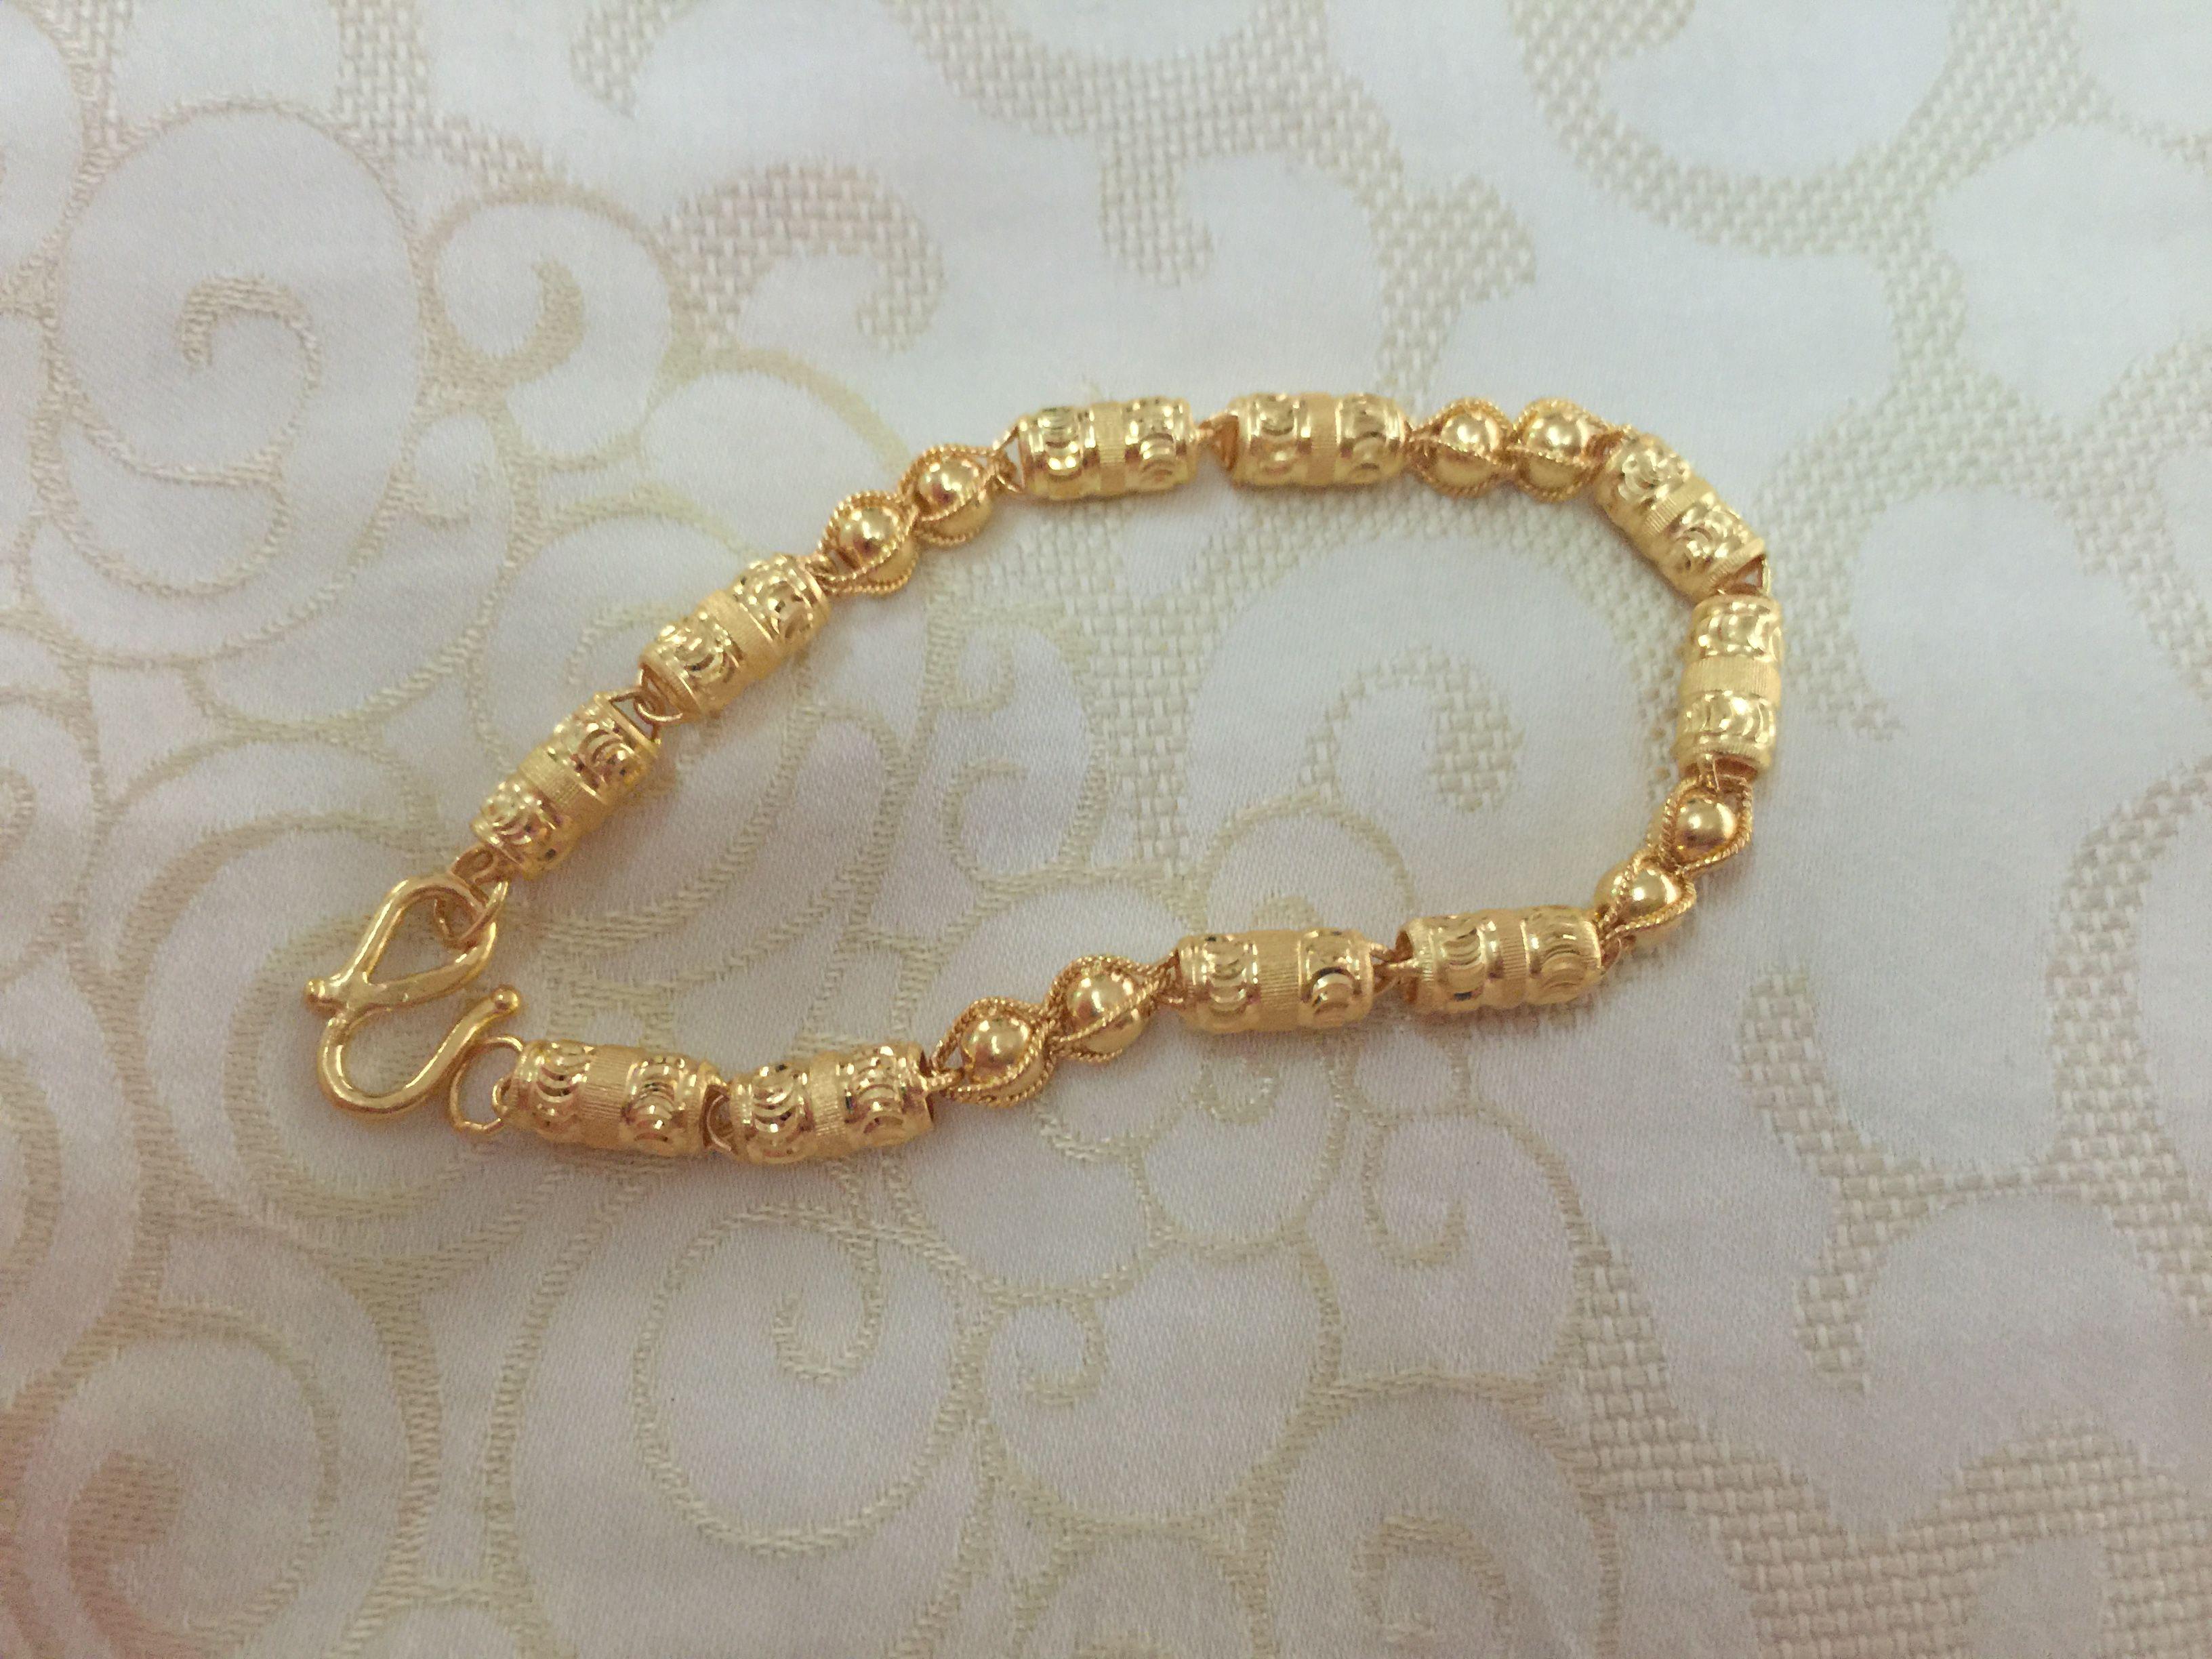 24k Gold Hong Kong Ornament Bracelet 22k 24k Gold Jewelry